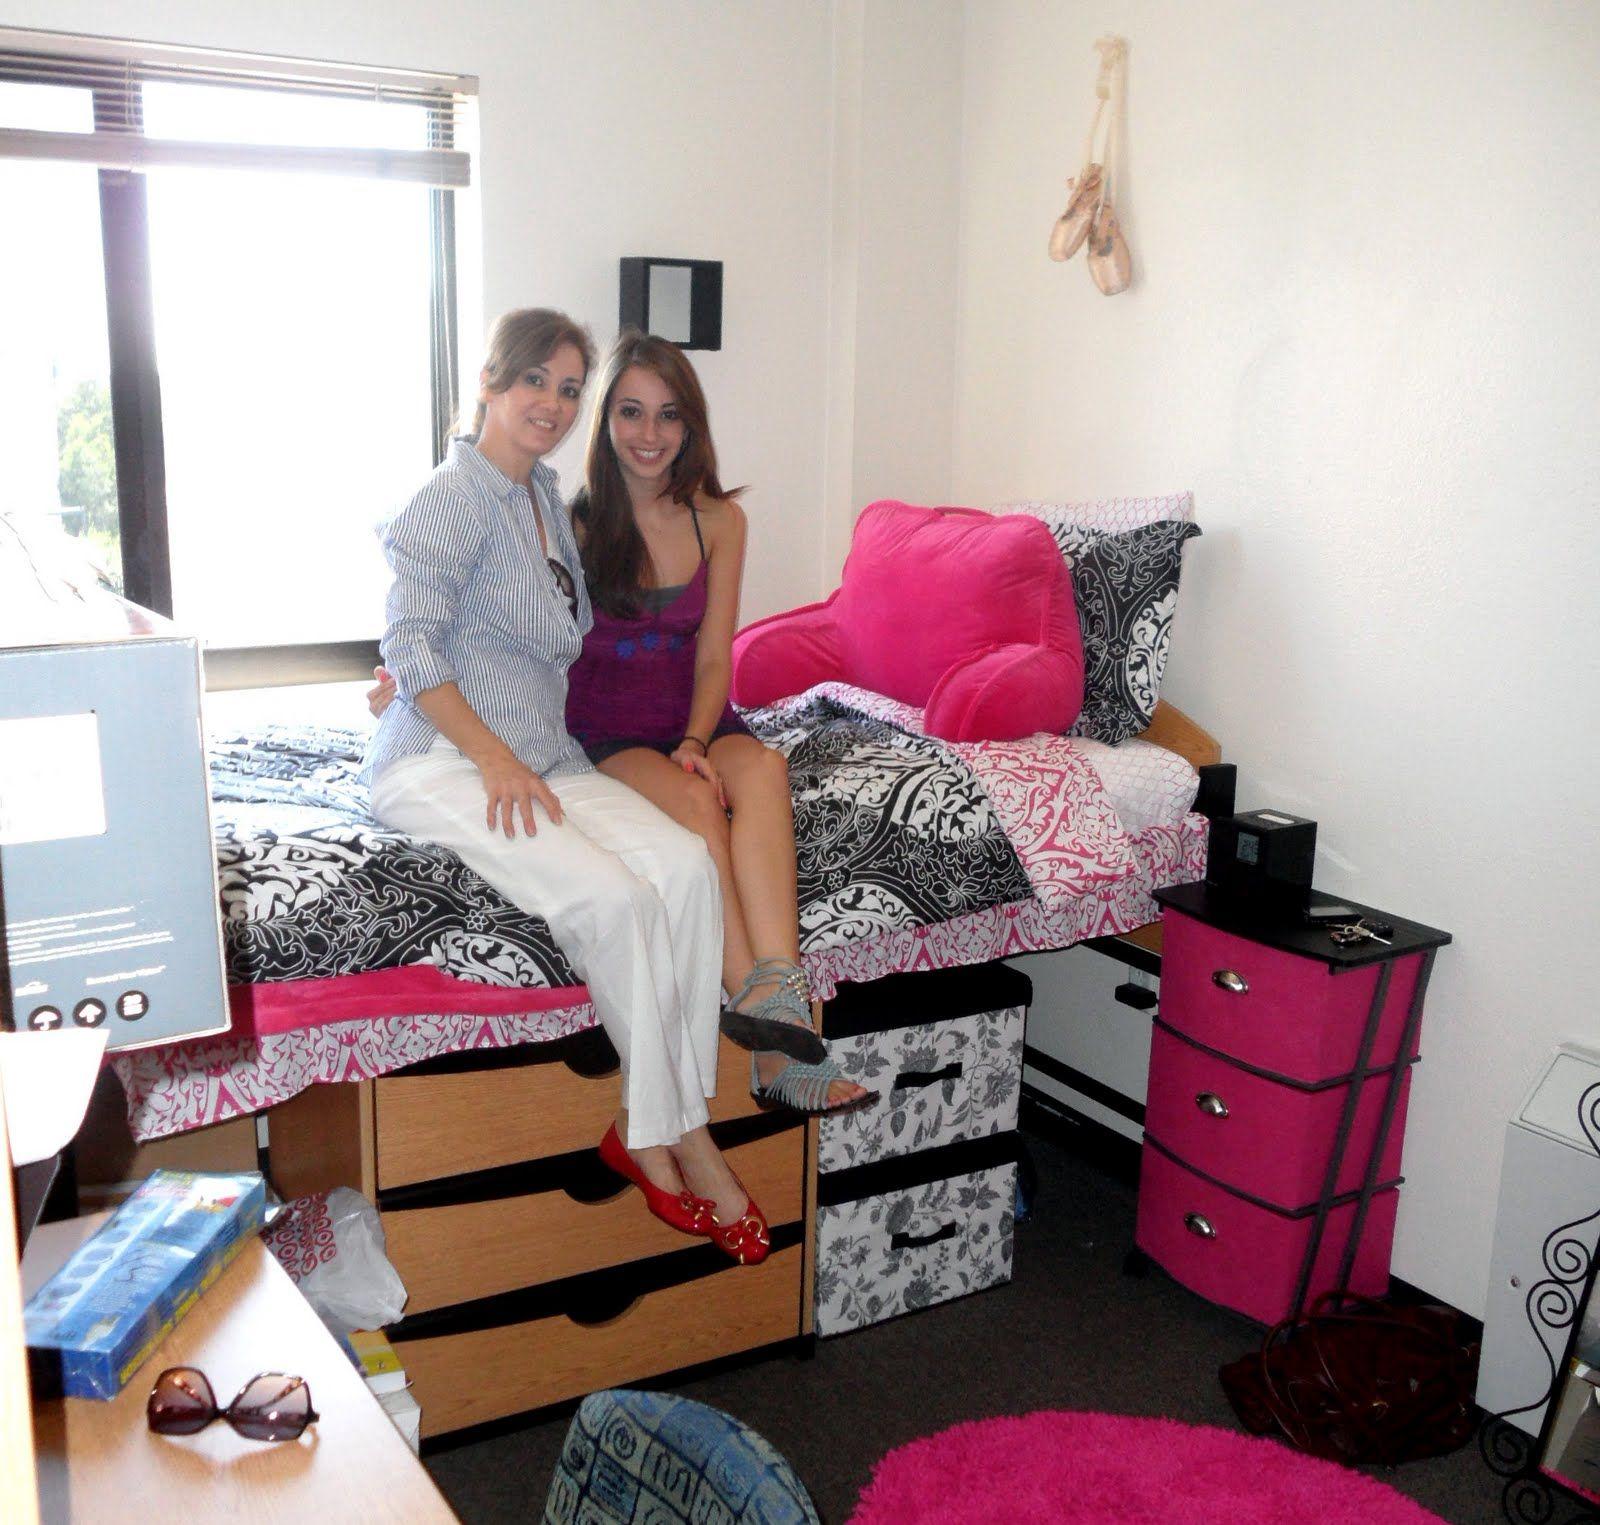 17 best images about college dorm ideas on pinterest cute dorm ideas dorm and storage